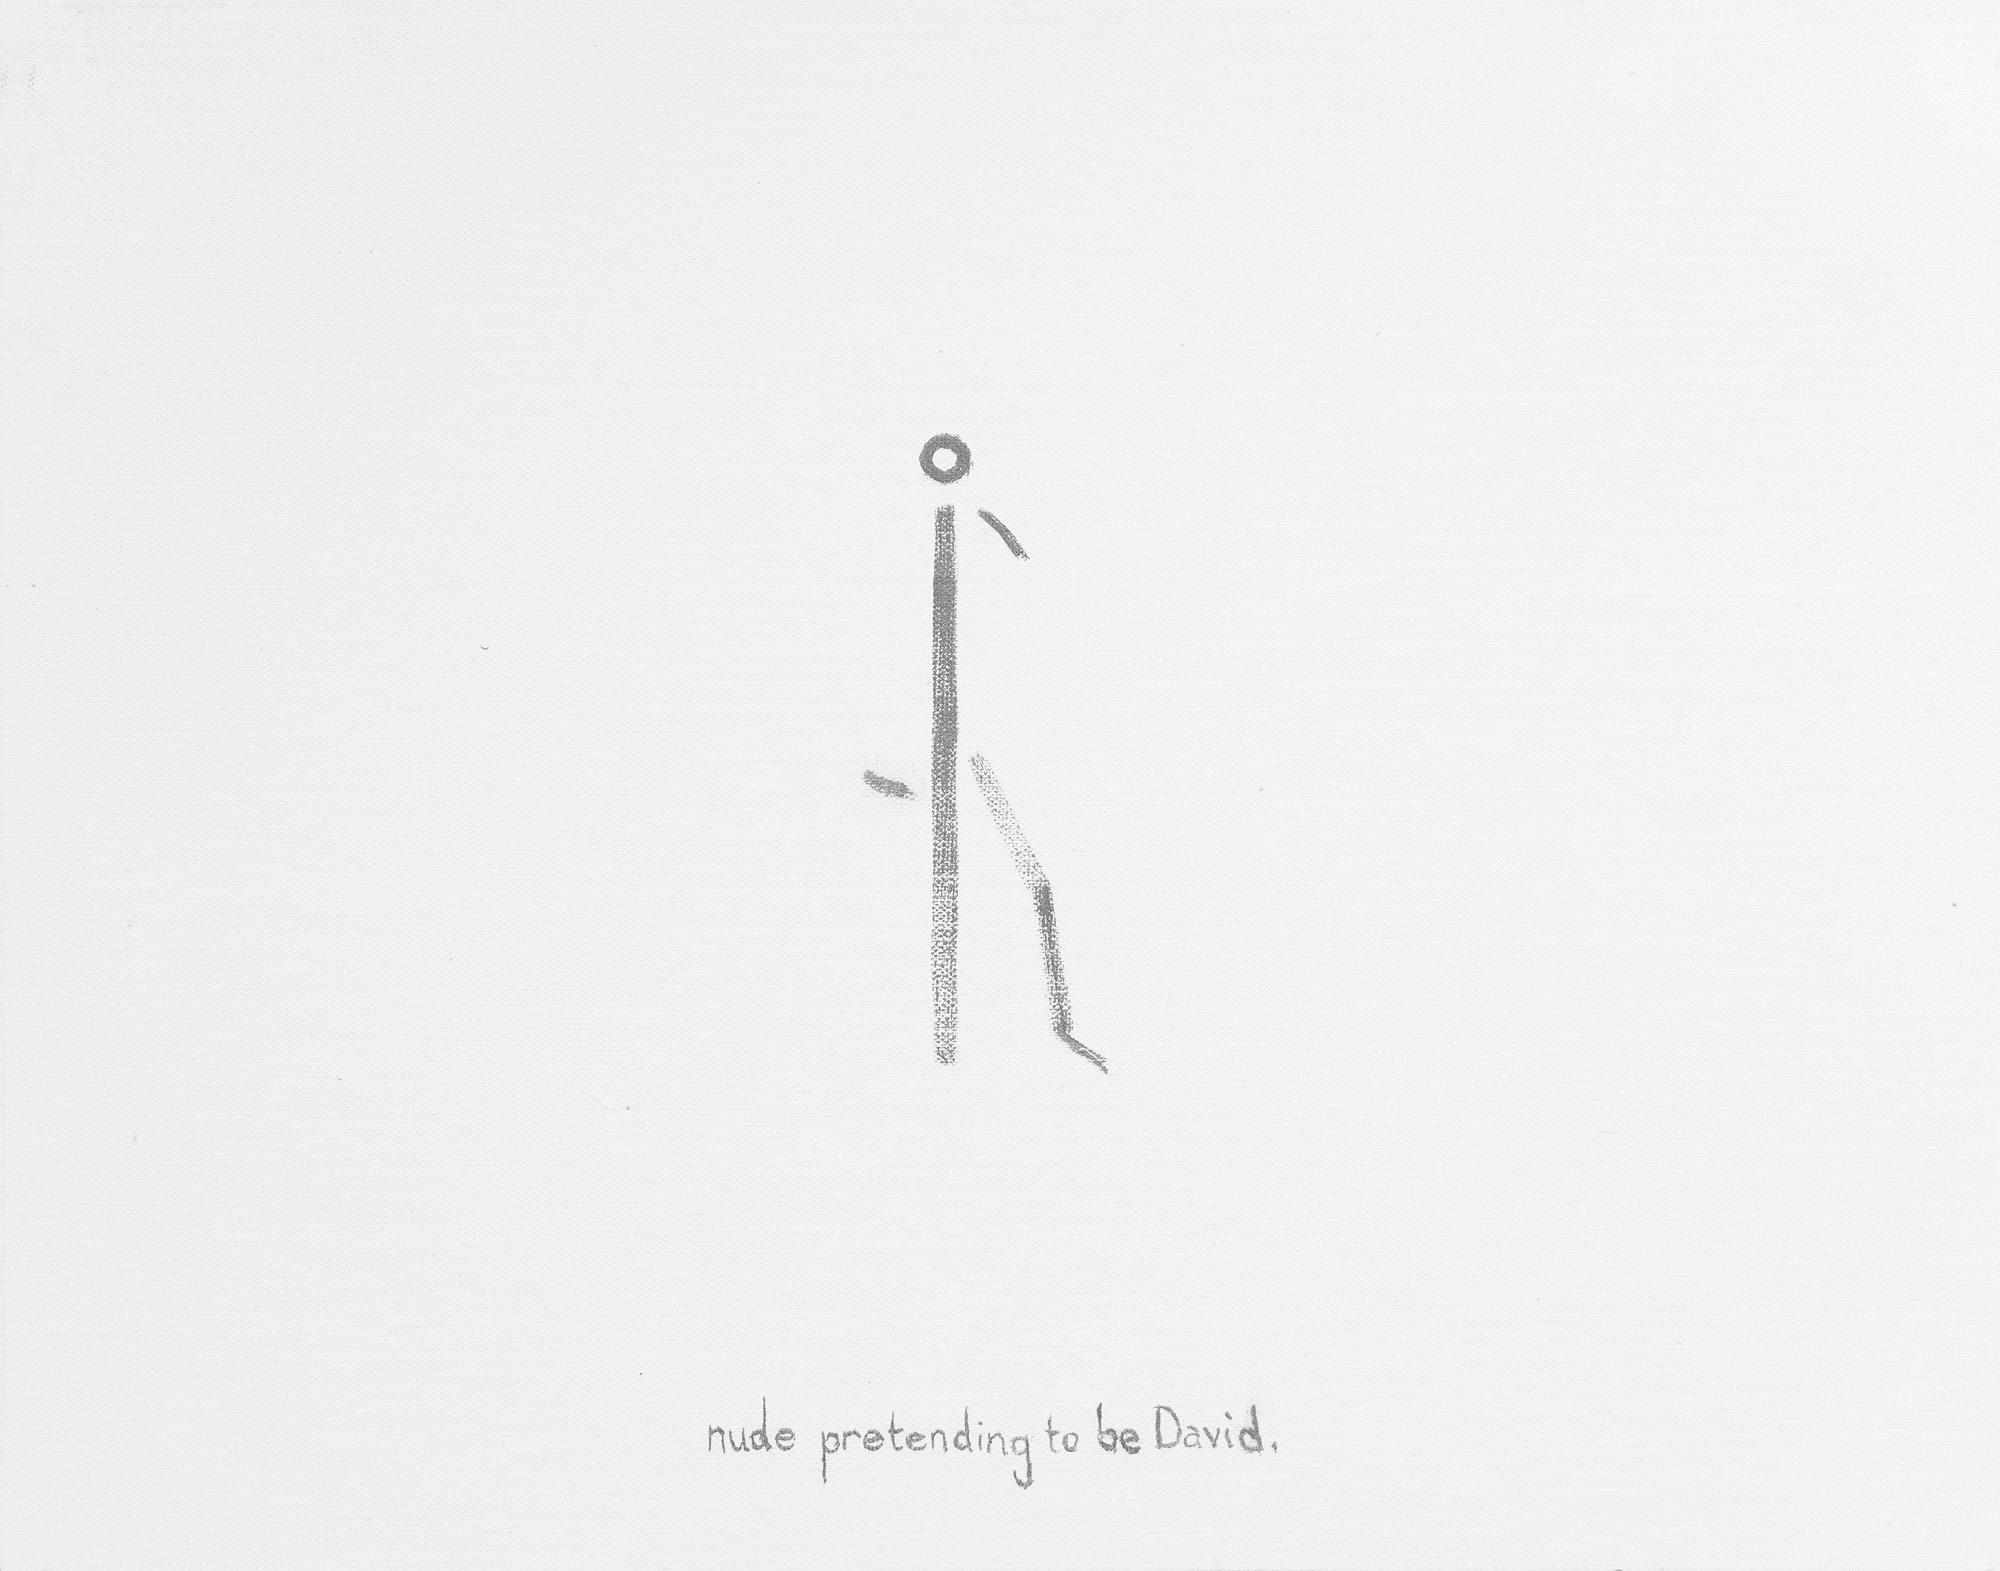 Nude Pretending to be David